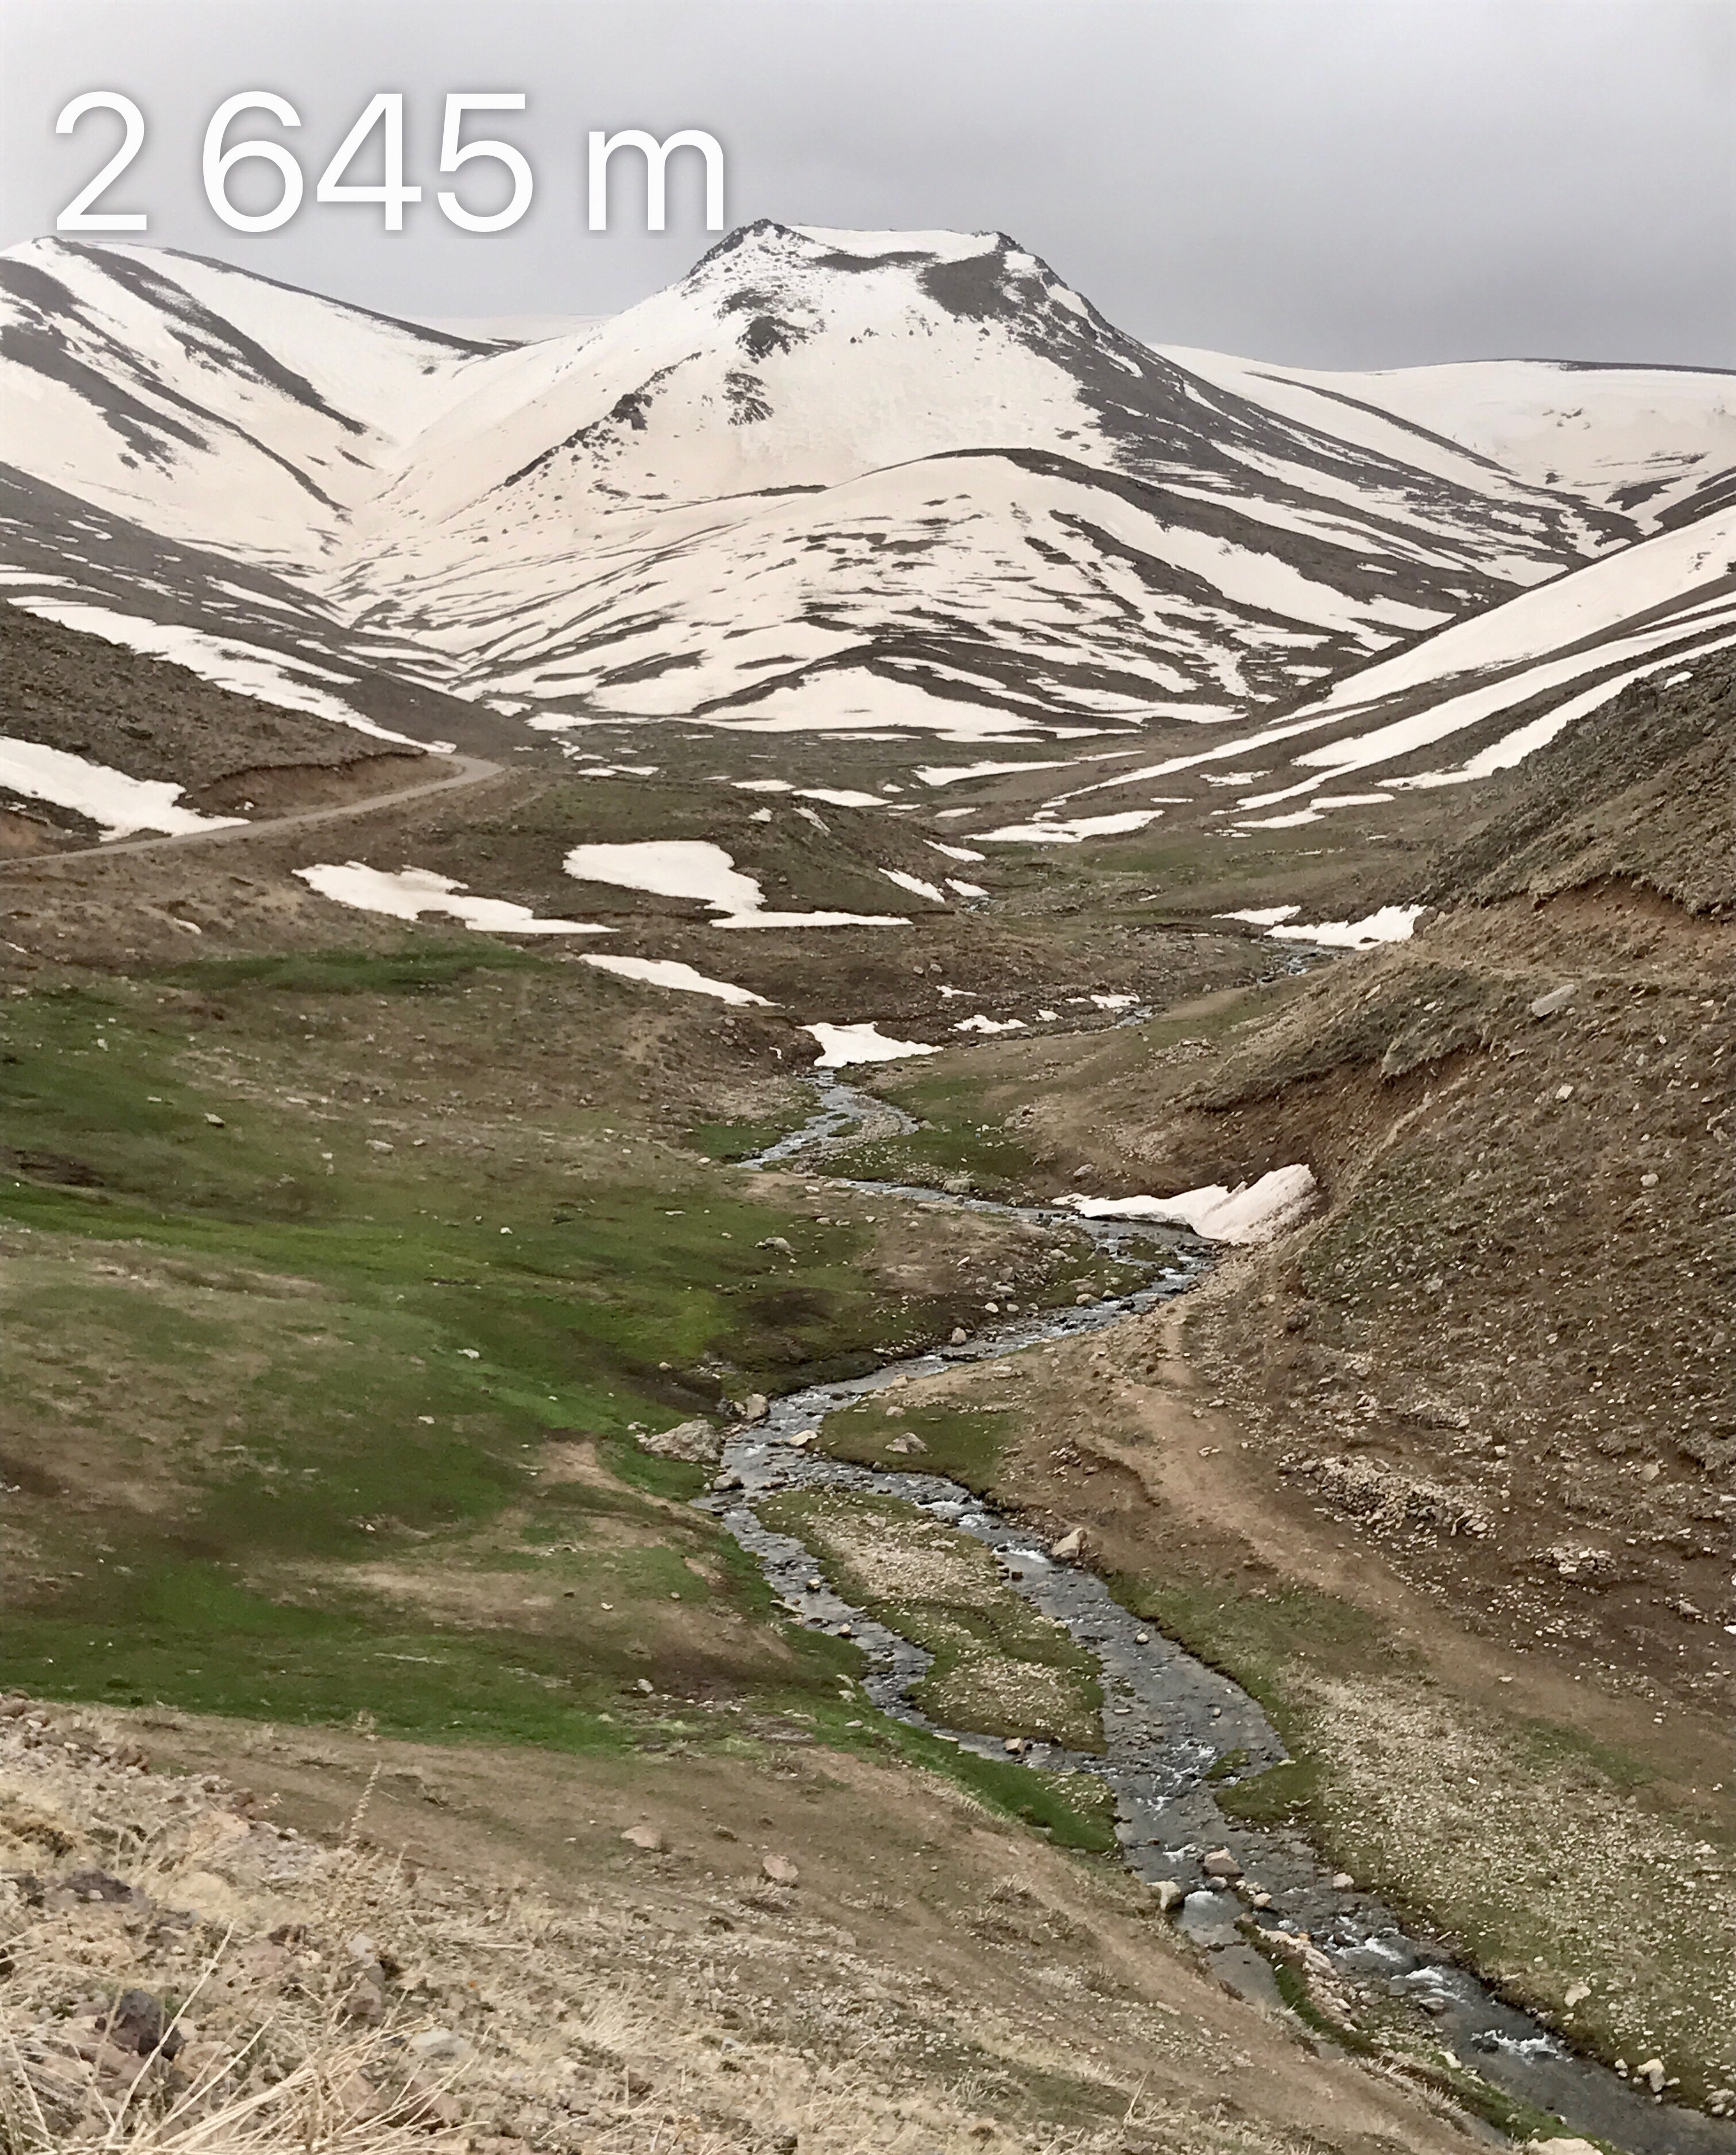 Kandovan village troglodyte à 60 km de Tabriz,